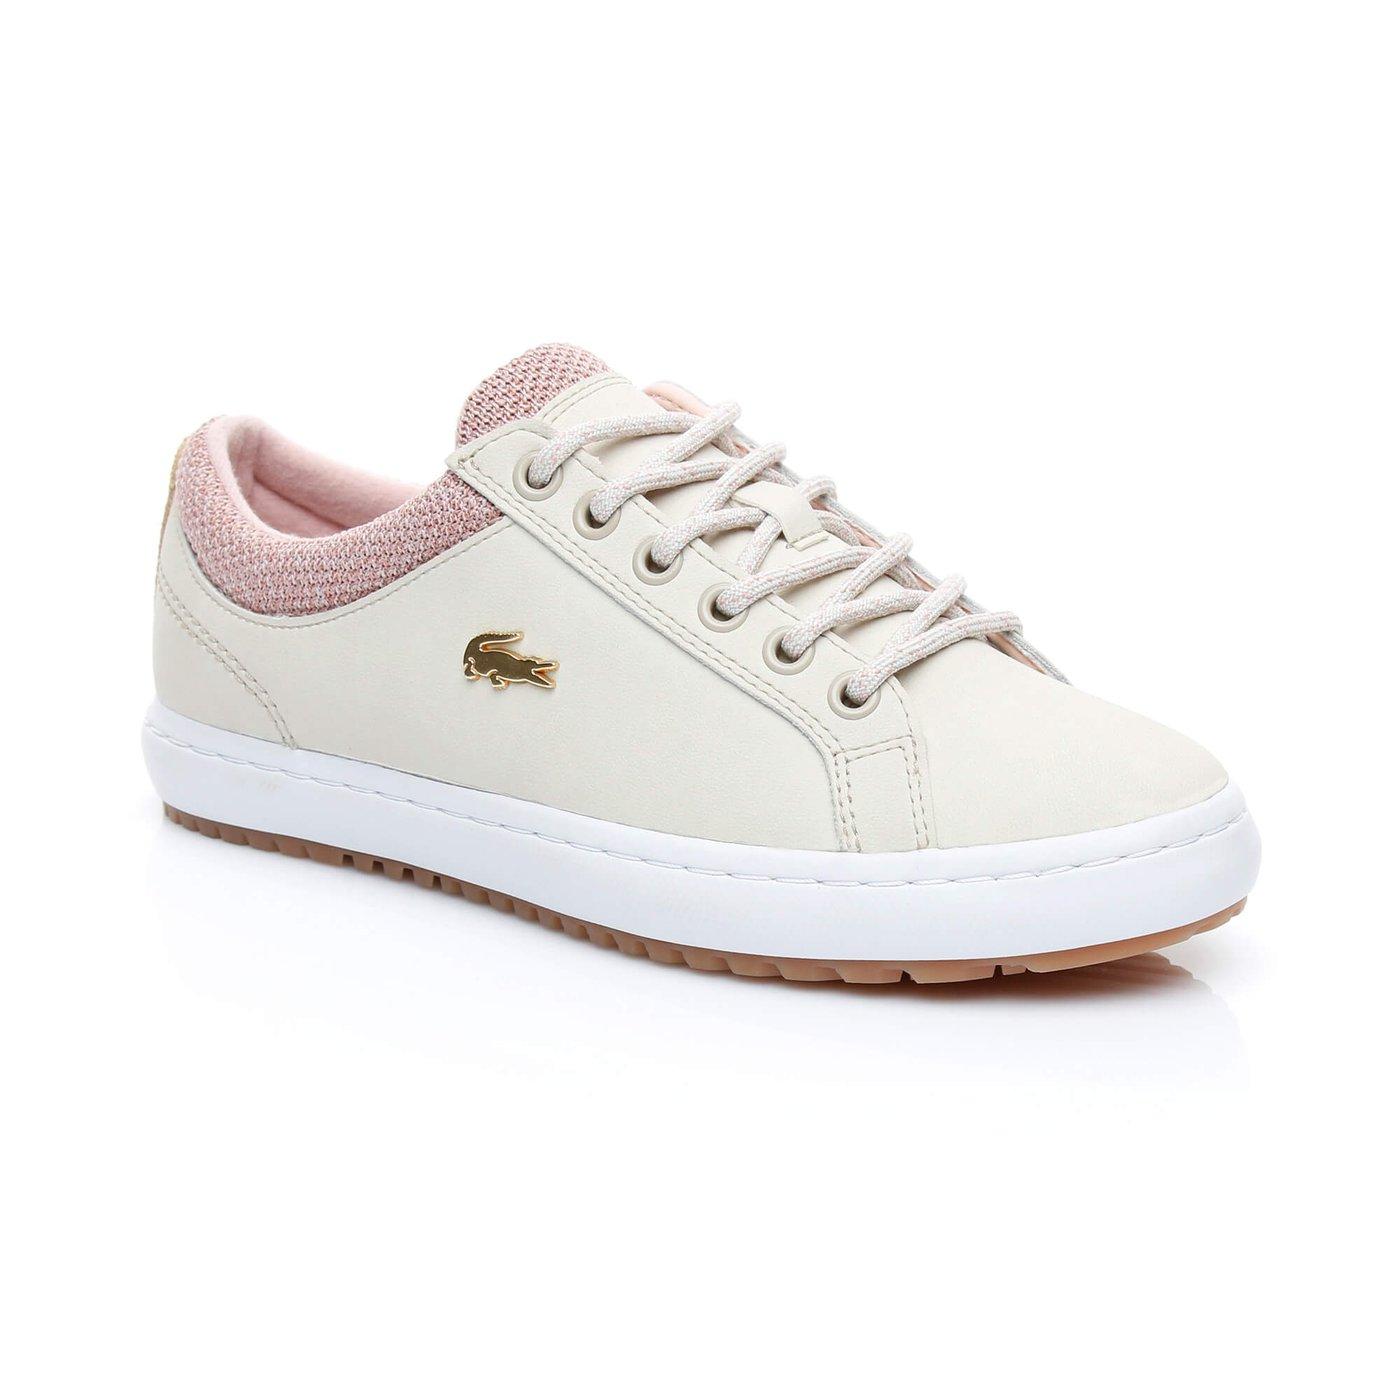 Lacoste Straightset İnsulate 3181 Kadın Krem Sneaker